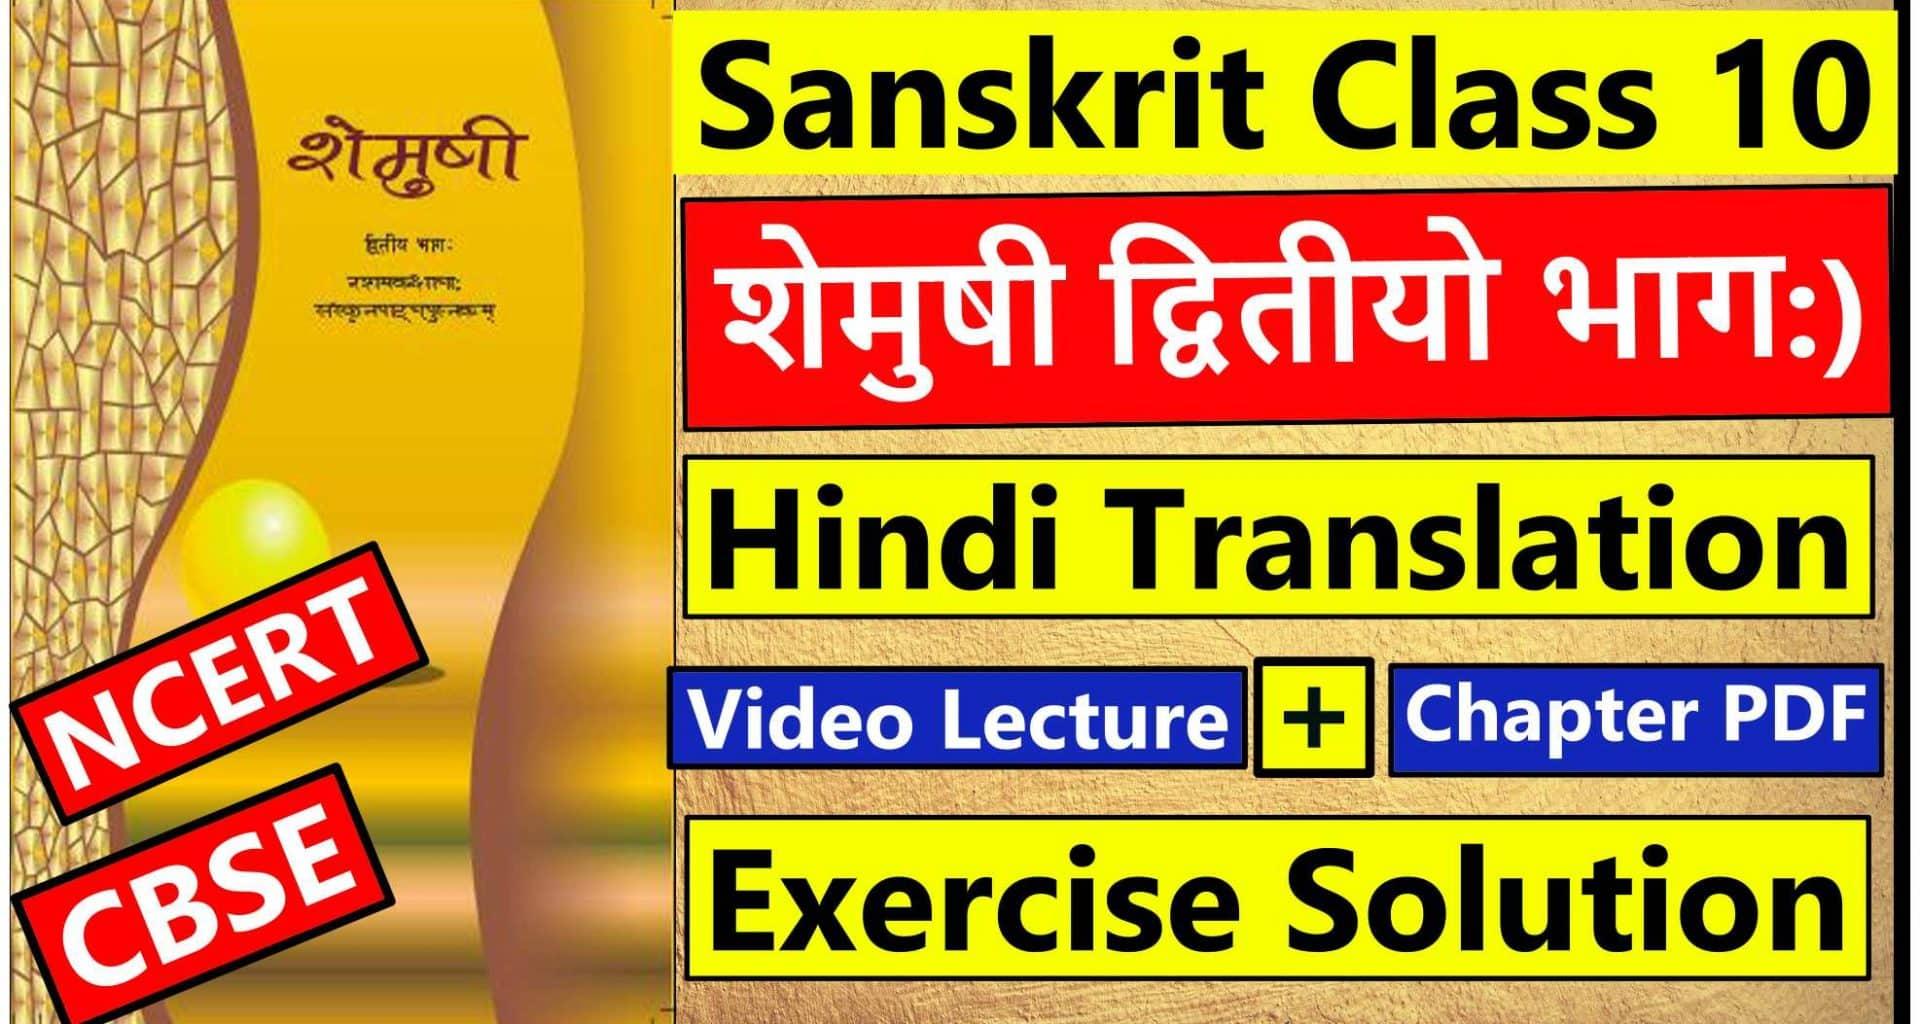 CBSE Sanskrit Class 10 (शेमुषी द्वितीयो भाग:)